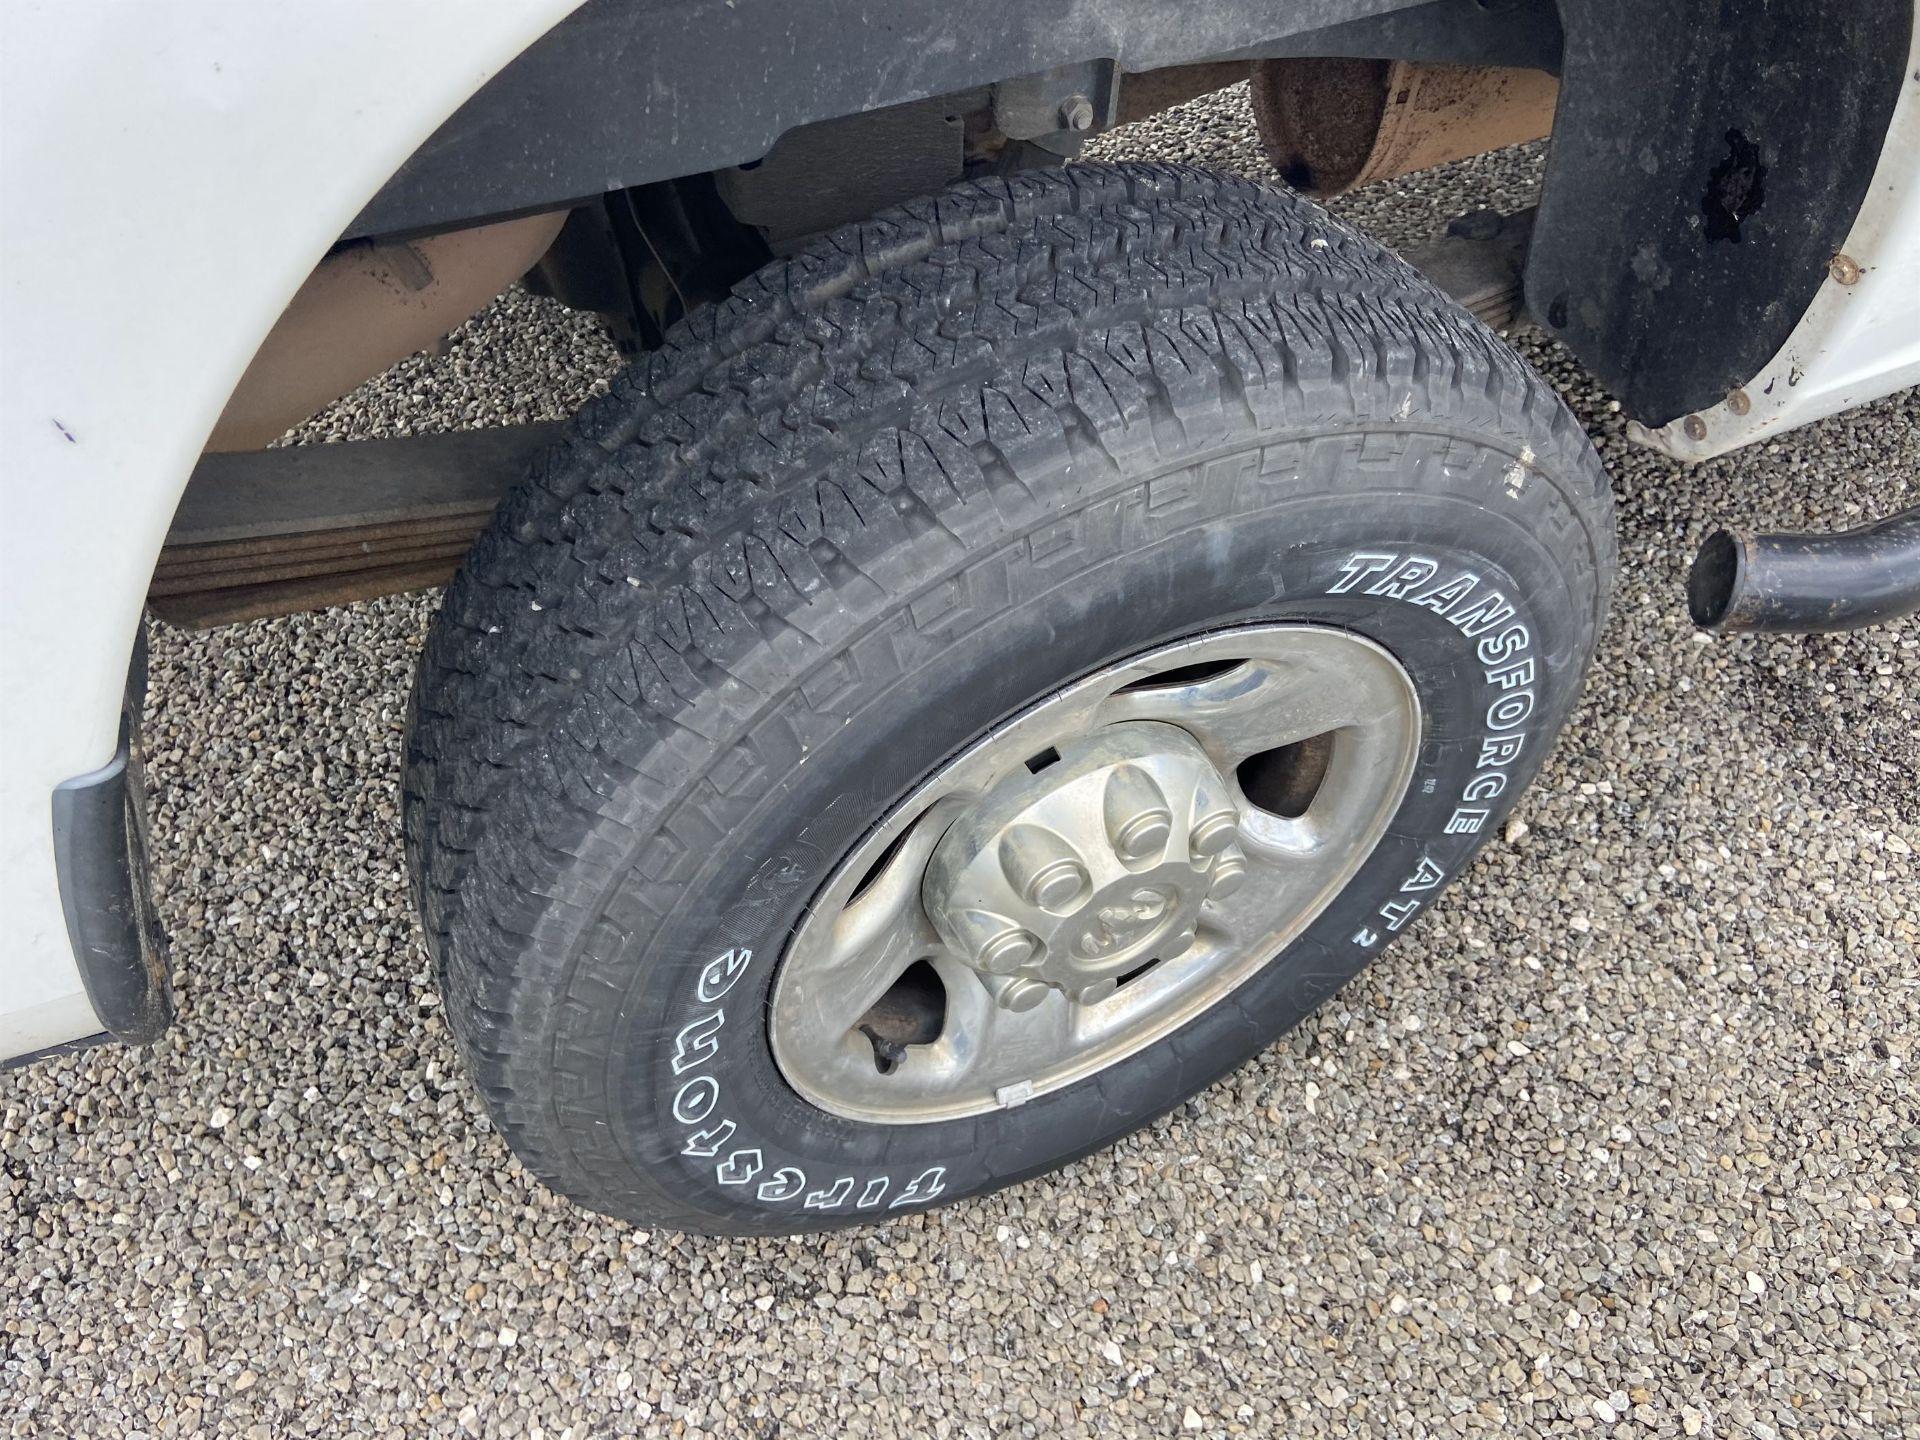 2011 Dodge Ram 2500 HD Crew Cab Long Bed, 212k Miles, Vinyl, 4x4, Gas, VIN # 3D7TT2CT9BG626009 - Image 6 of 16